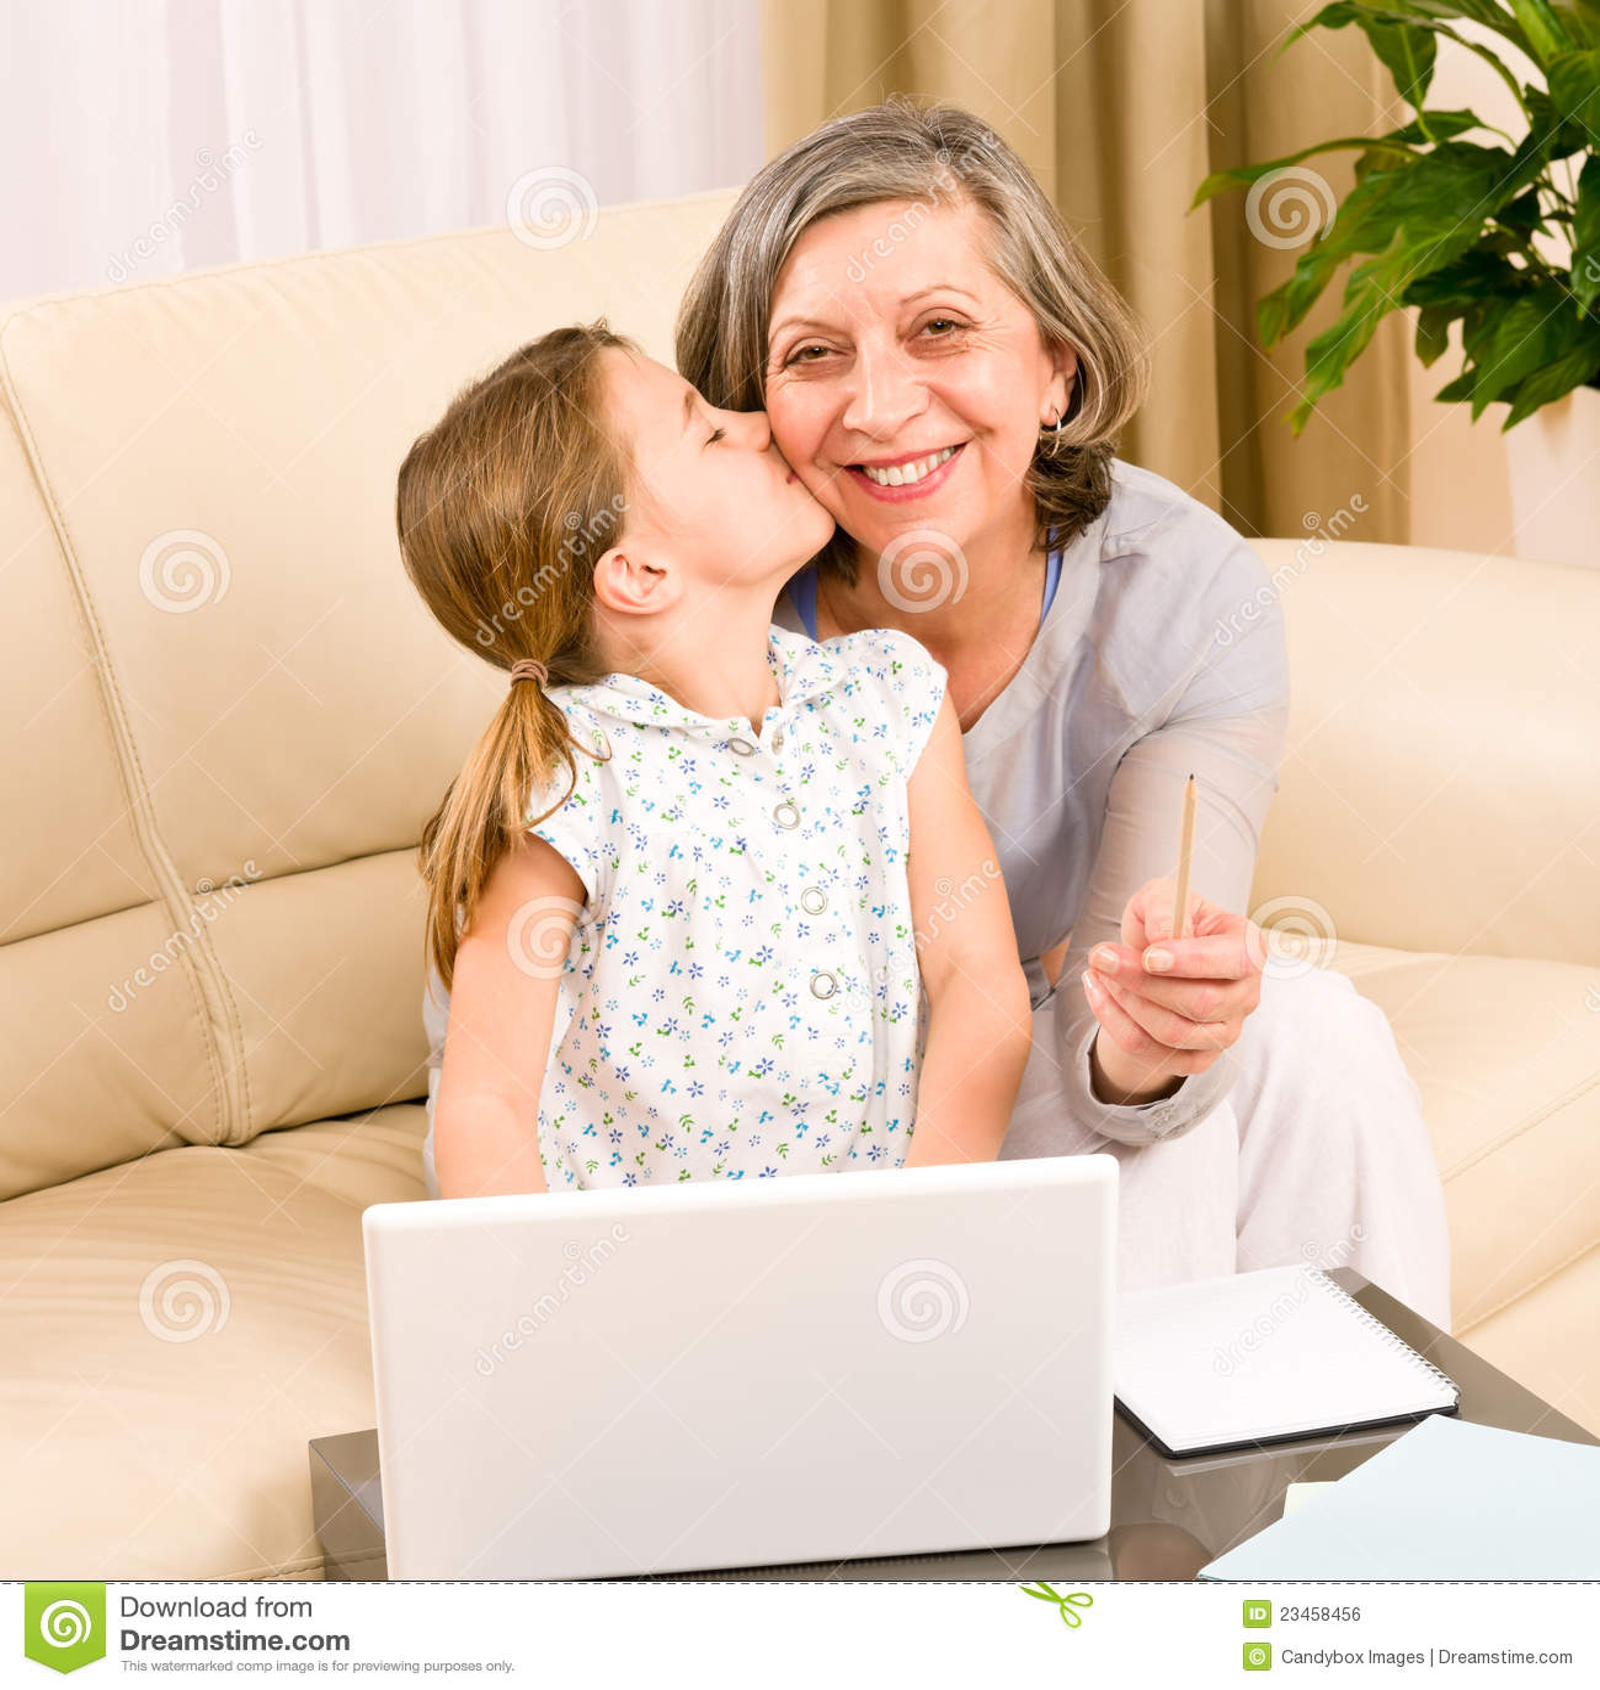 Granddaughter giving kiss to grandmother smiling together on sofa.